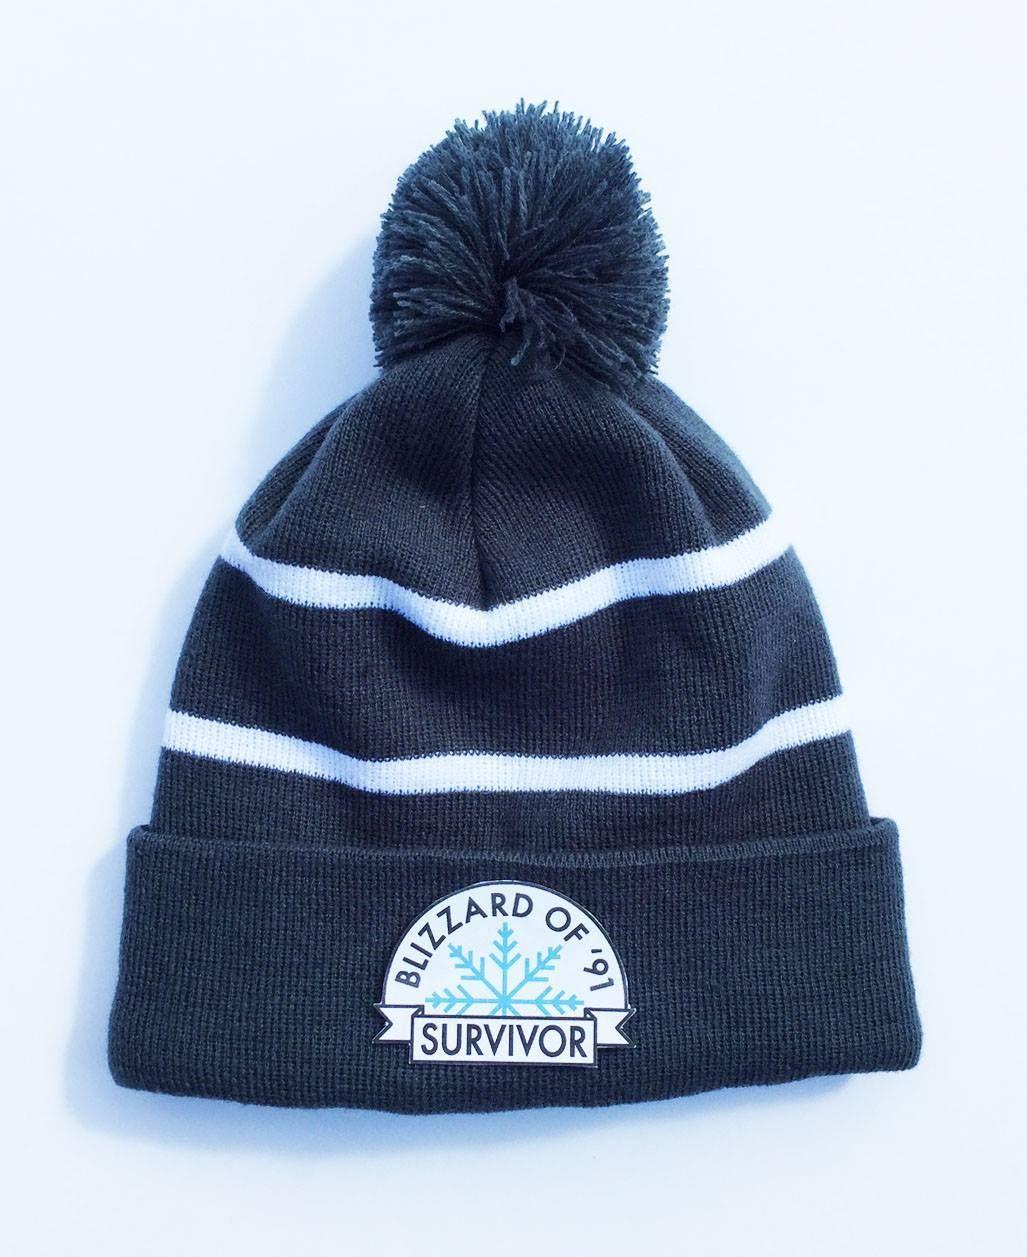 Last Chance Minnesota Blizzard Of 91 Survivor Winter Pom Hat